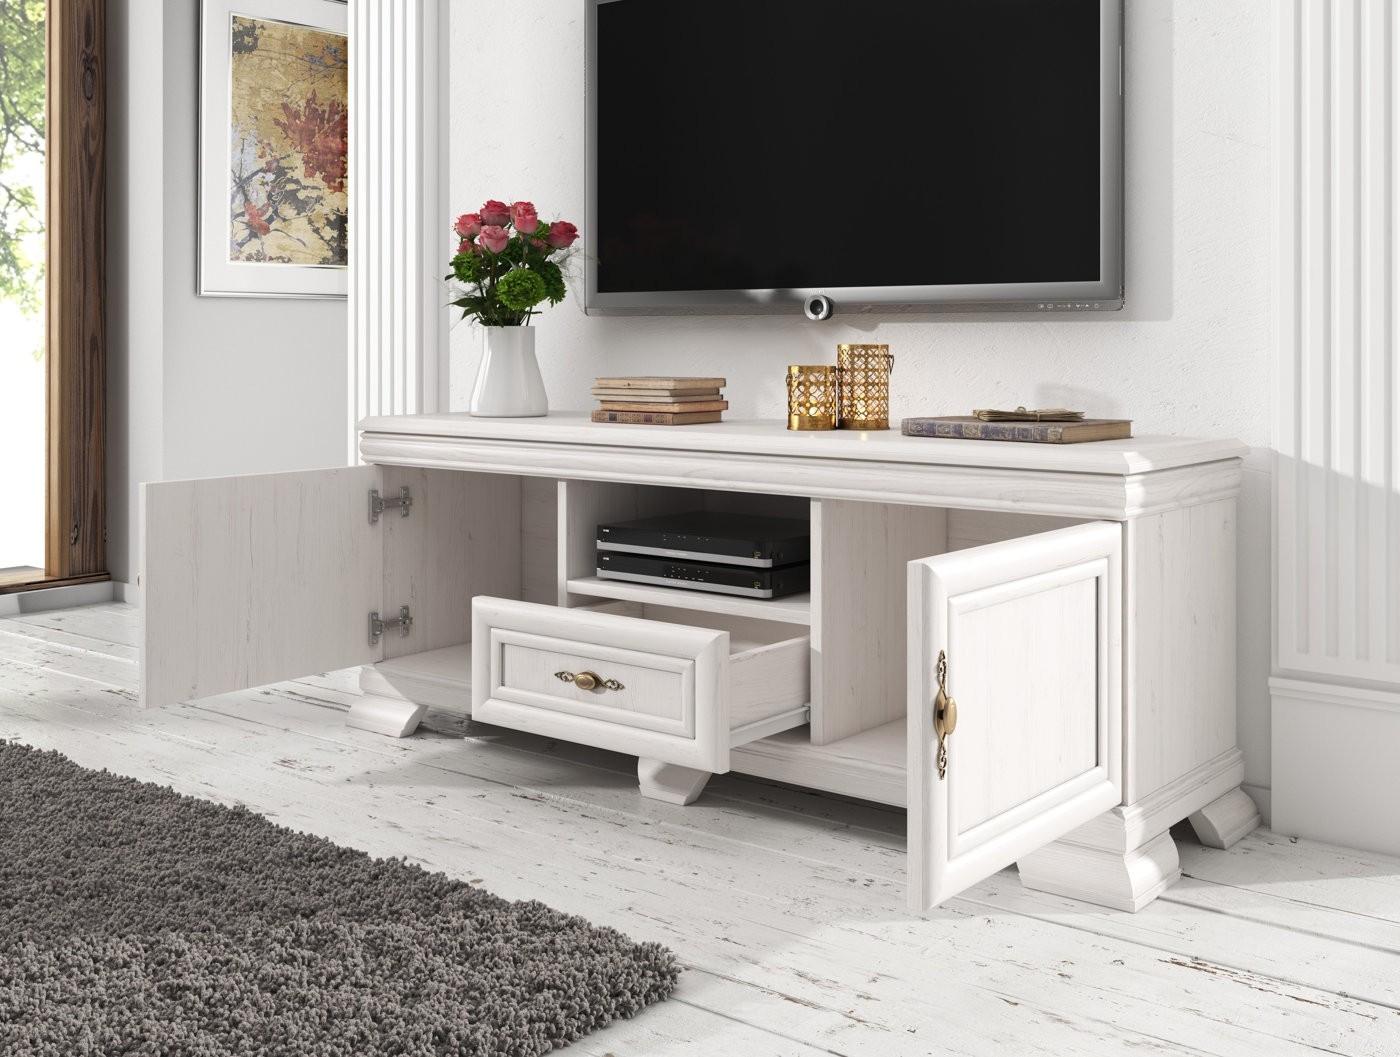 Tv meubel kresto wit 158 cm meubella for Showroommodellen design meubels